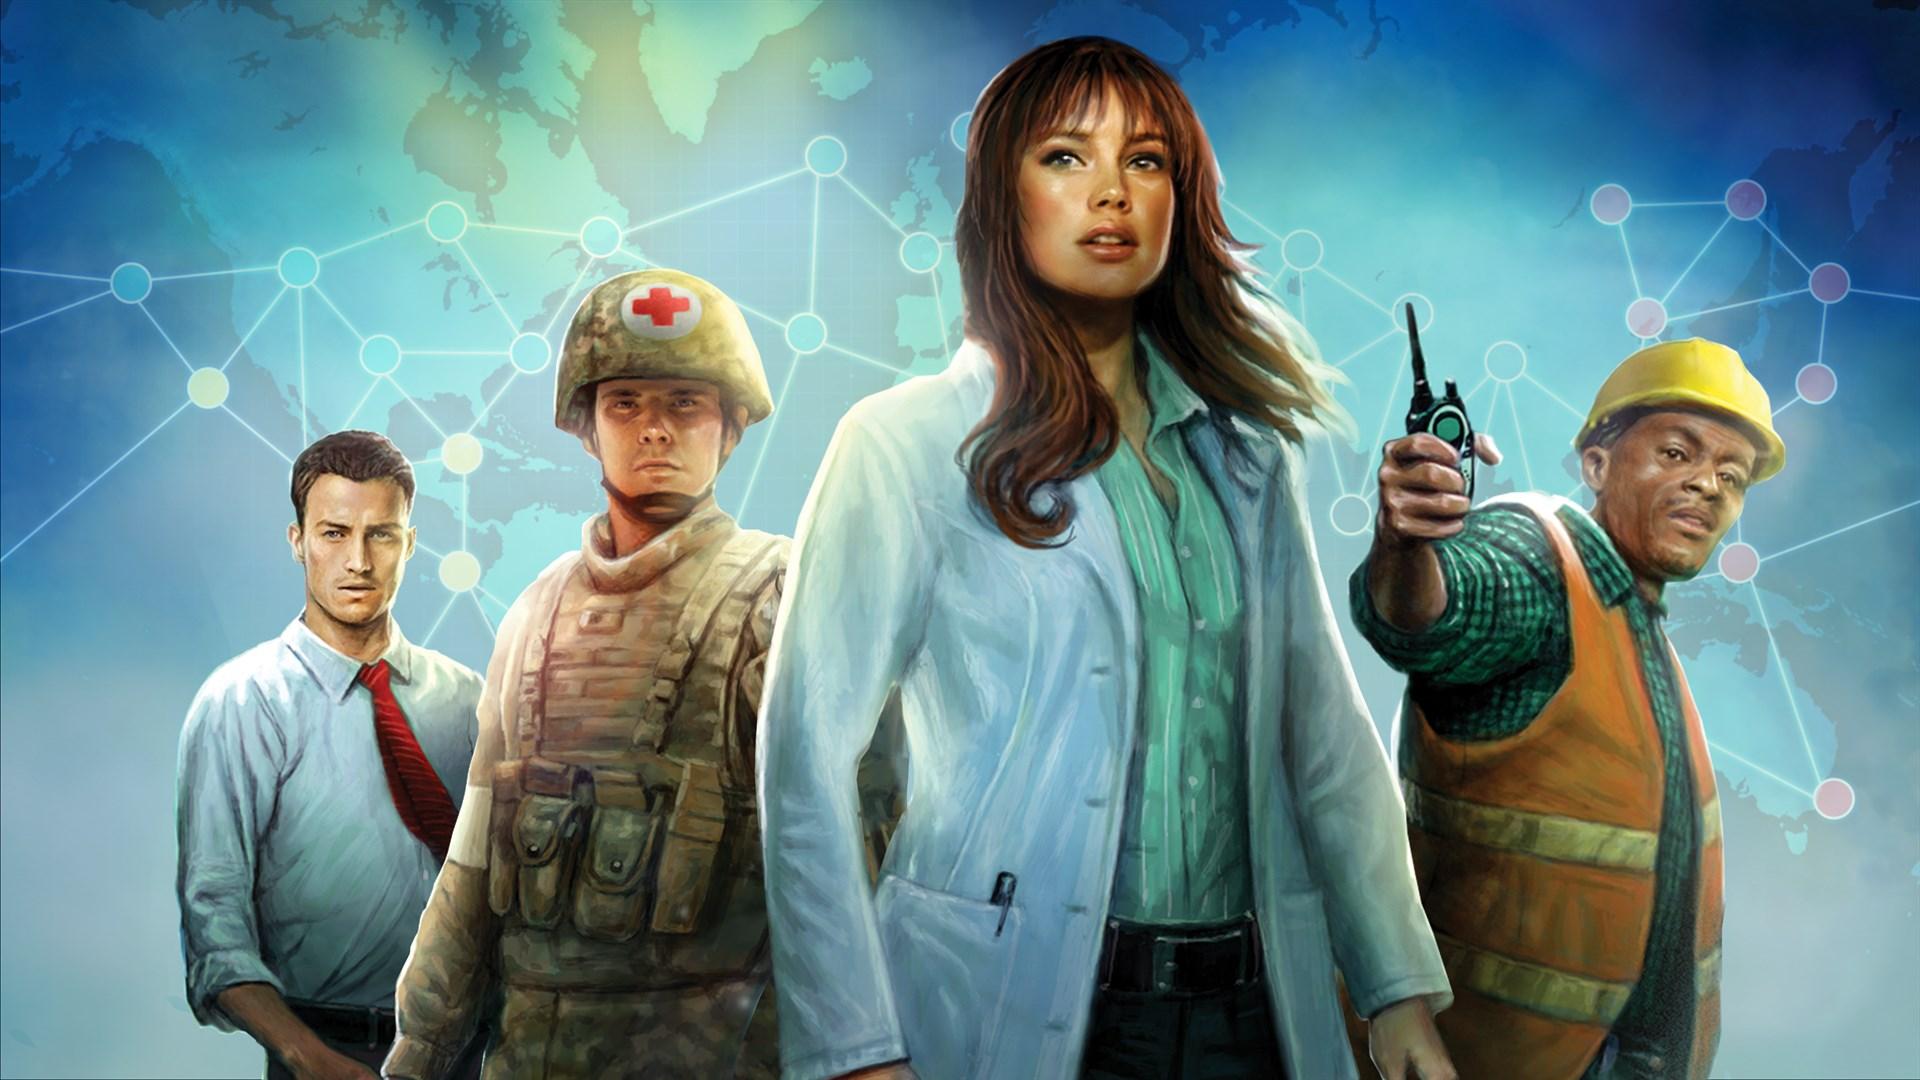 www.videogameschronicle.com